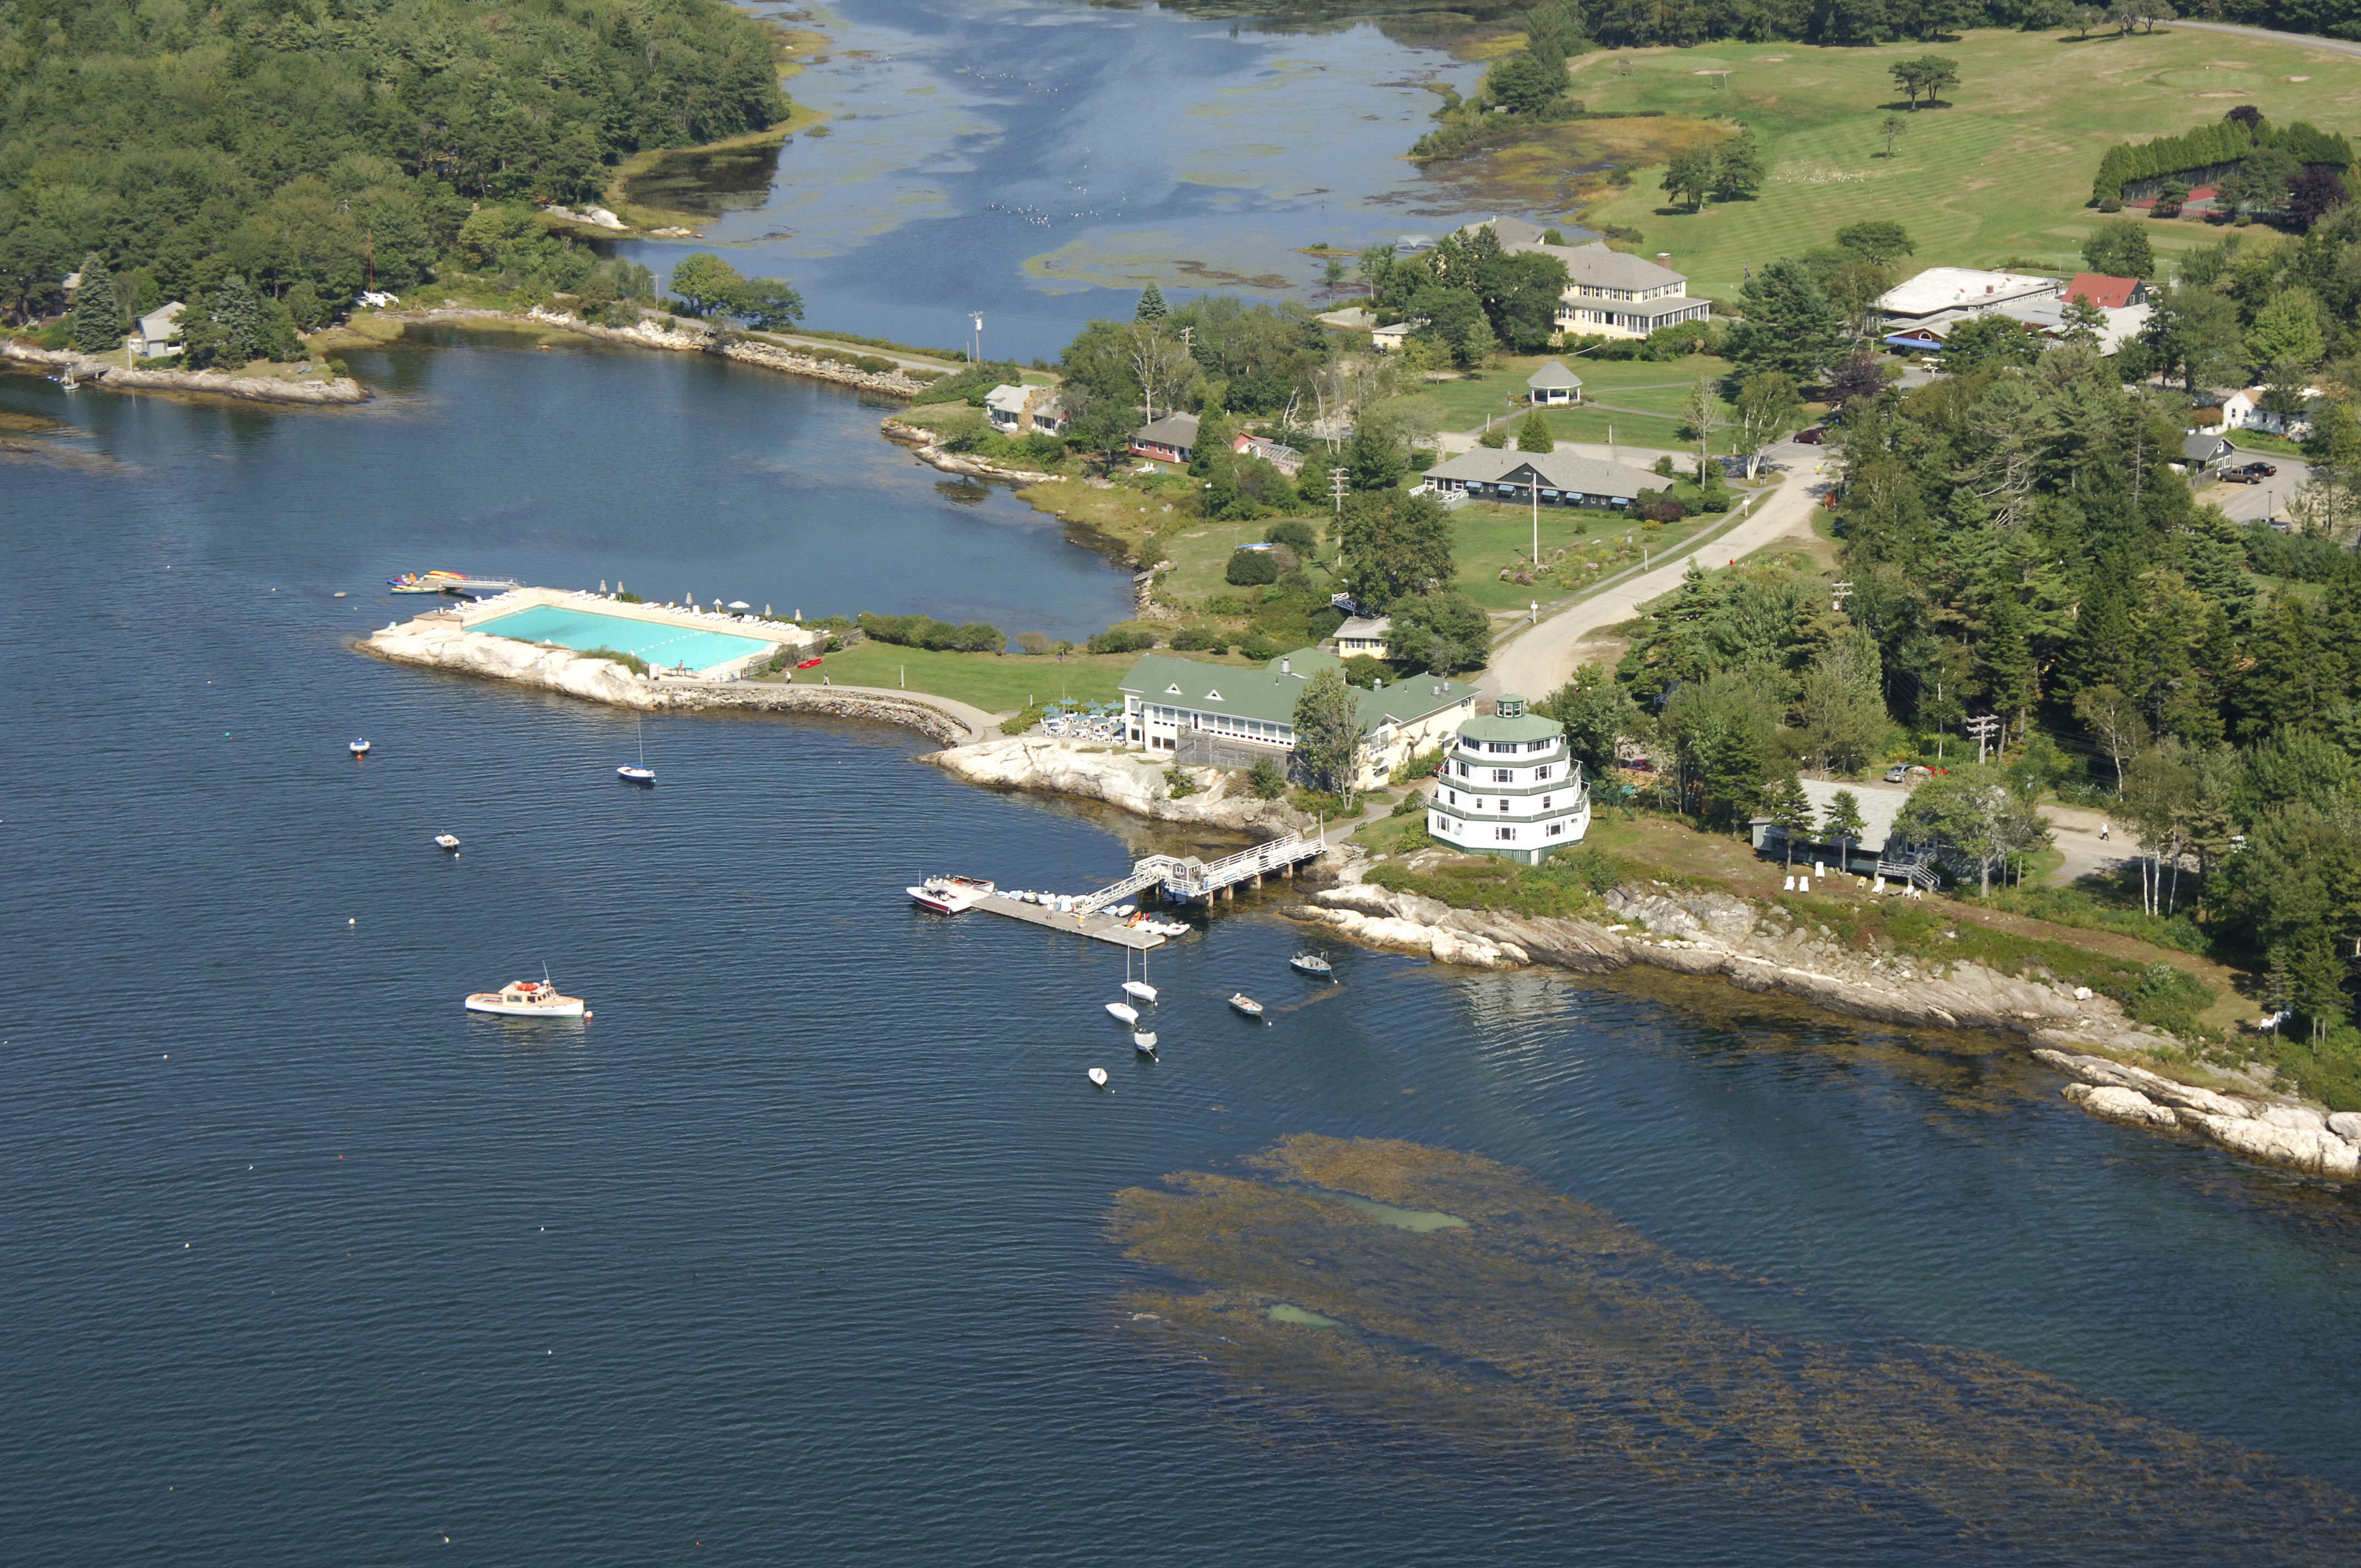 sebasco estates Sebasco harbor resort sebasco estates - 3 star hotel the comfortable sebasco harbor resort is a 3-star hotel and offers a picnic area, a swimming pool and a tennis.